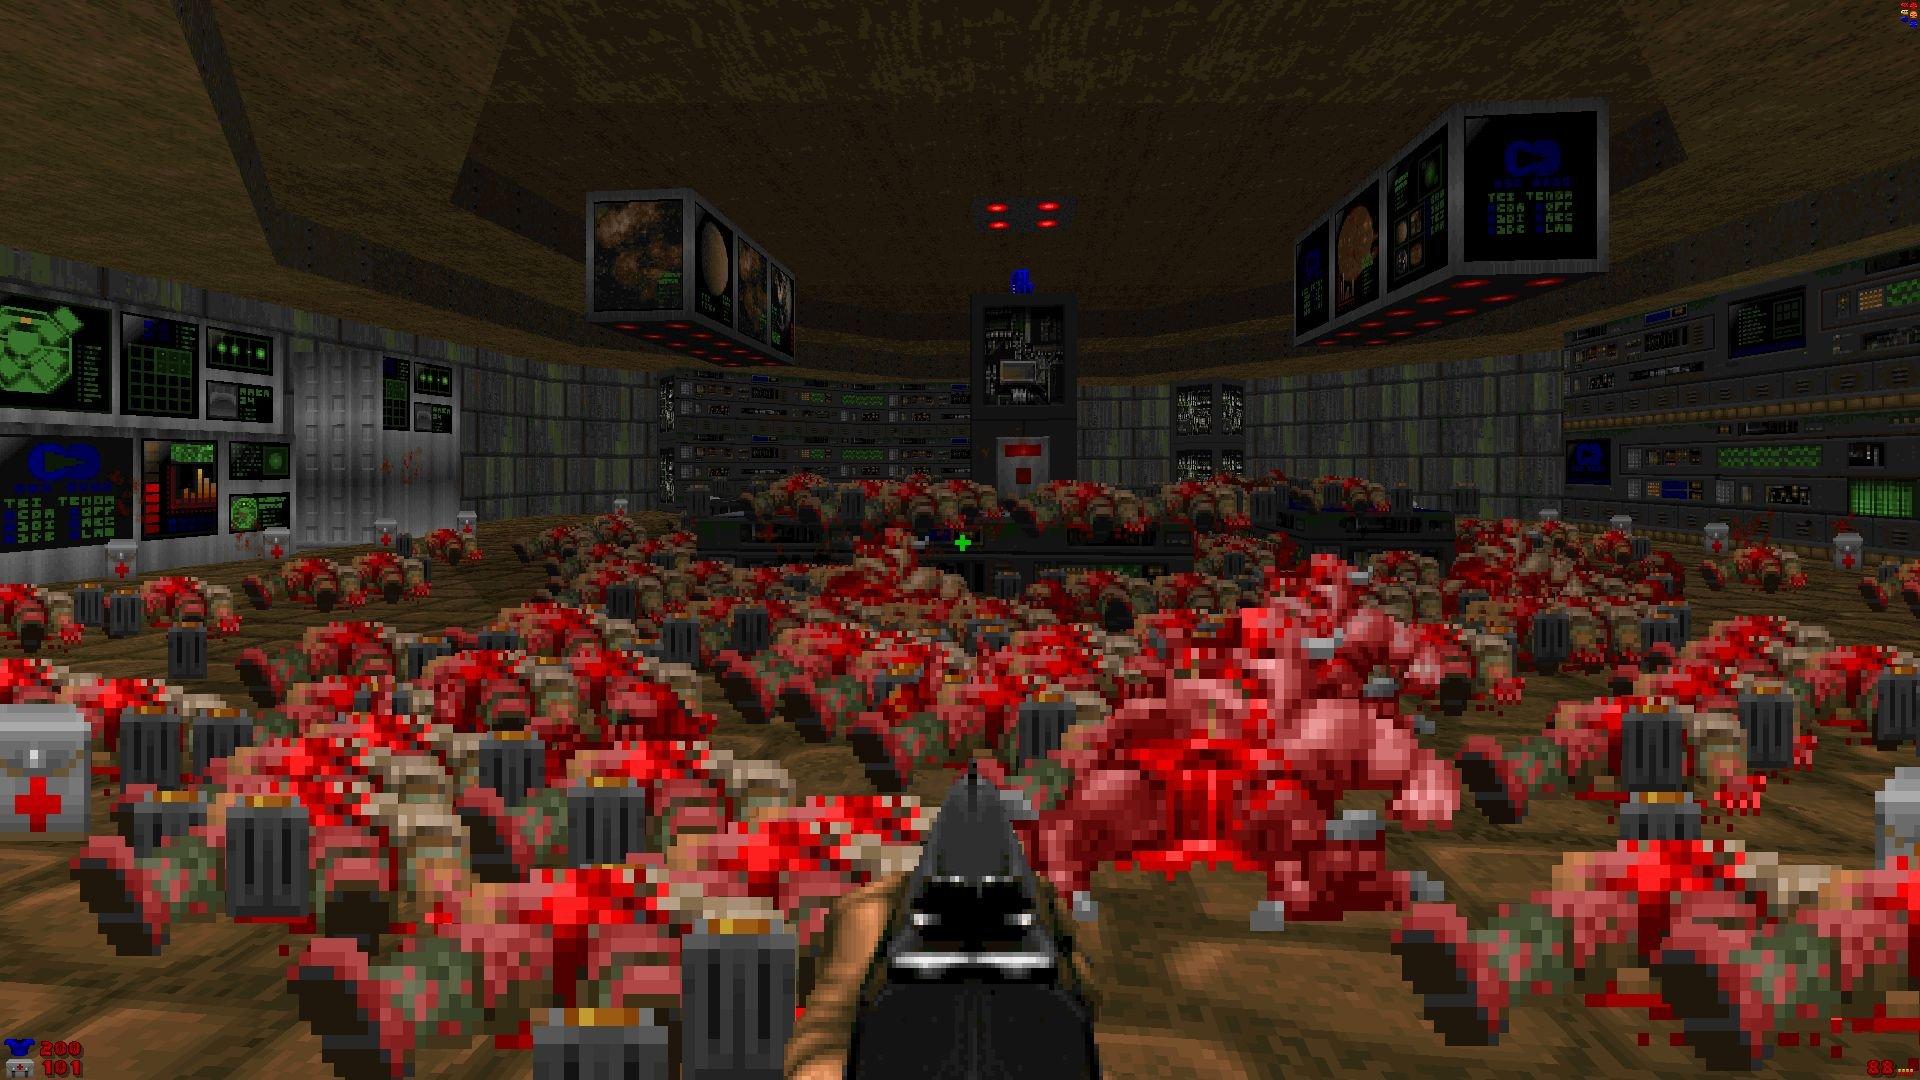 Screenshot_Doom_20200916_141749_1.jpg.f62e323c855d385d5e107a5f82d234bd.jpg